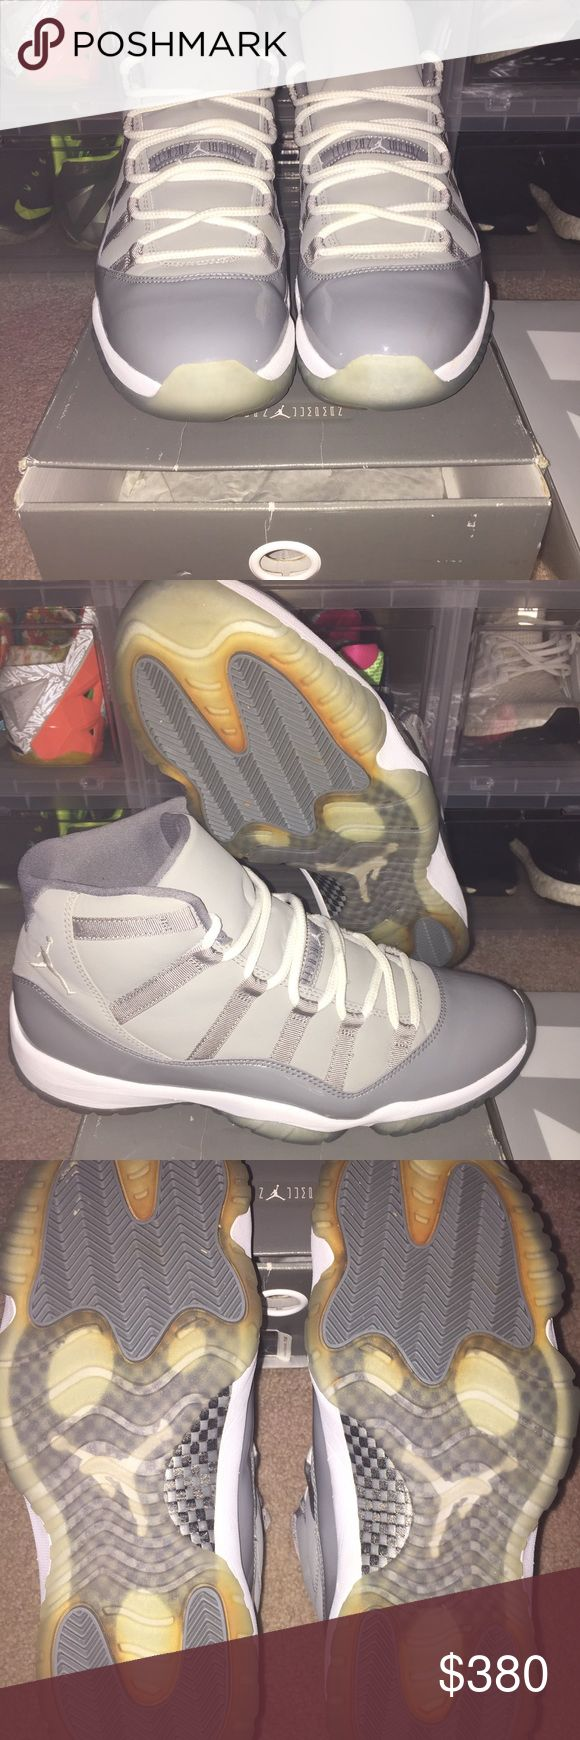 Jordan cool grey 11 OG all Jordan cool grey 11 wore 1x. 100% authentic Jordan Shoes Athletic Shoes